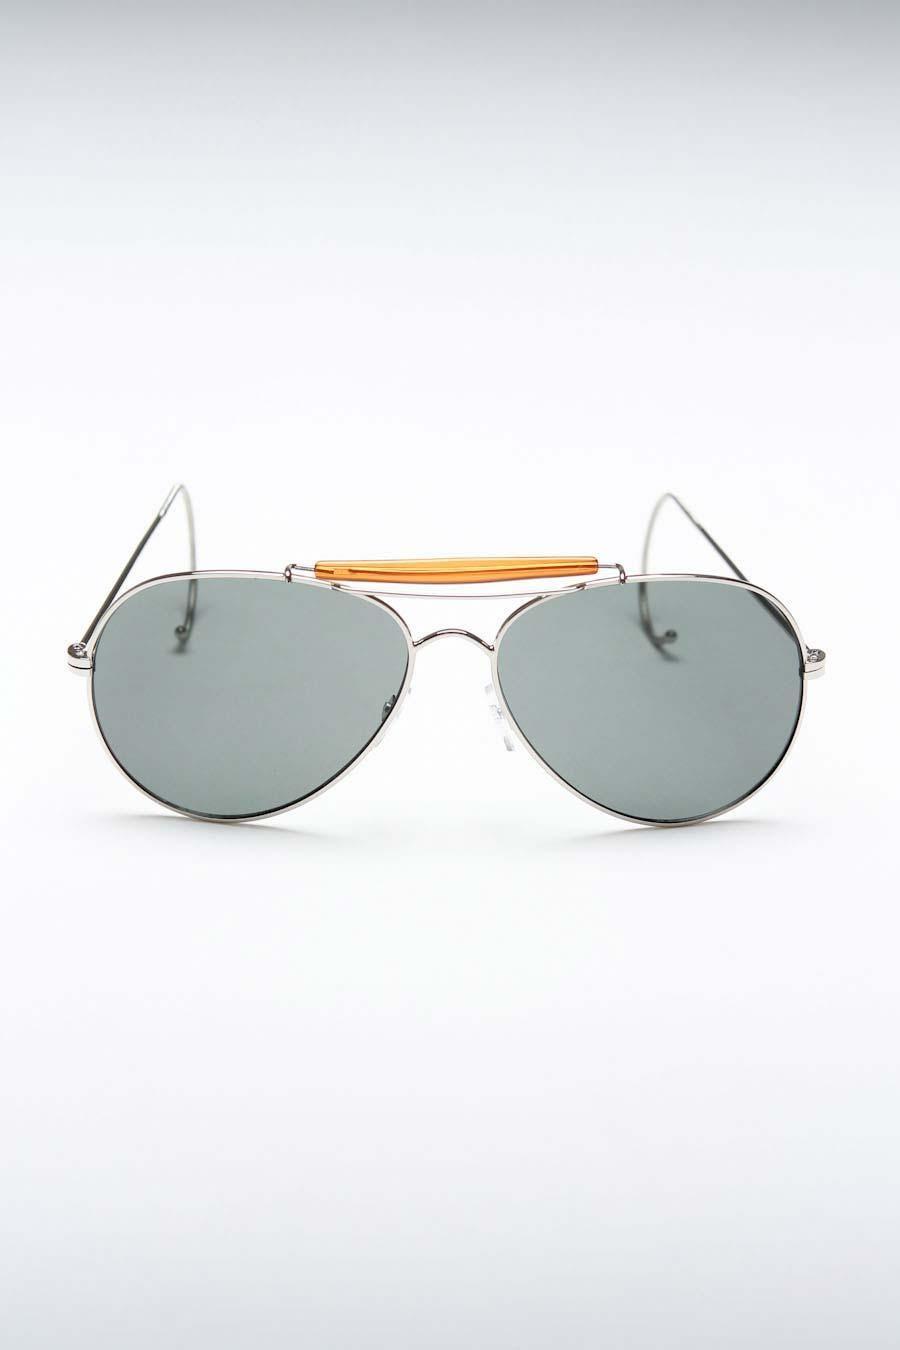 9373b8b046cb Rothco Aviator Style Mirror Shades. www.facebook.com/...   Shades to ...